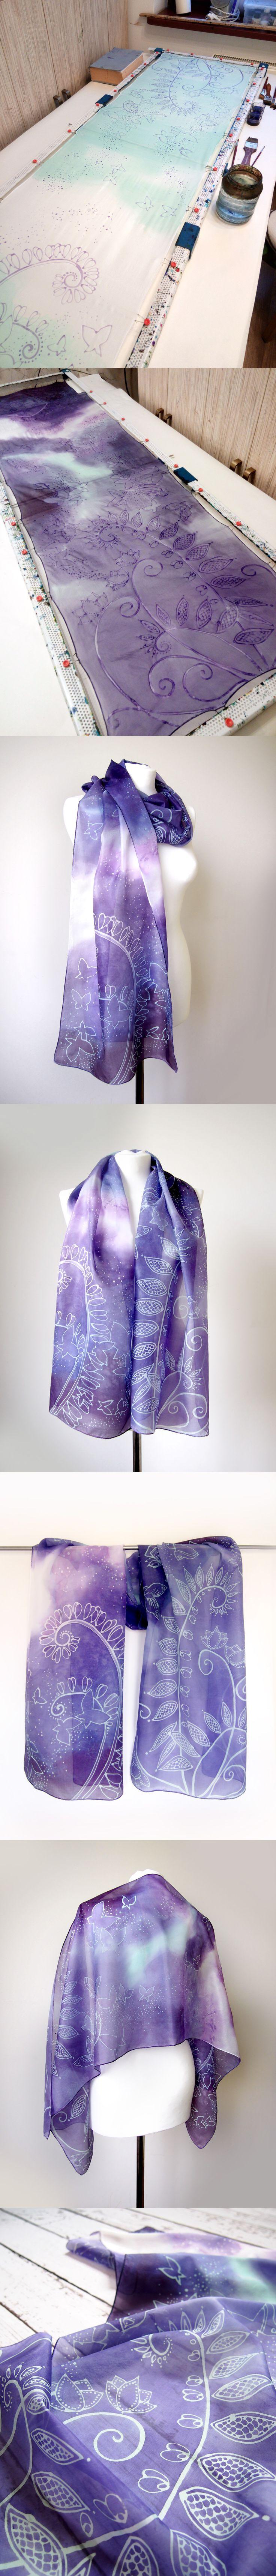 Silk #scarf #purple and #mint with a #zentangle pattern of #fern and #butterflies Hand painted by #MinkuLUL Luiza Malinowska